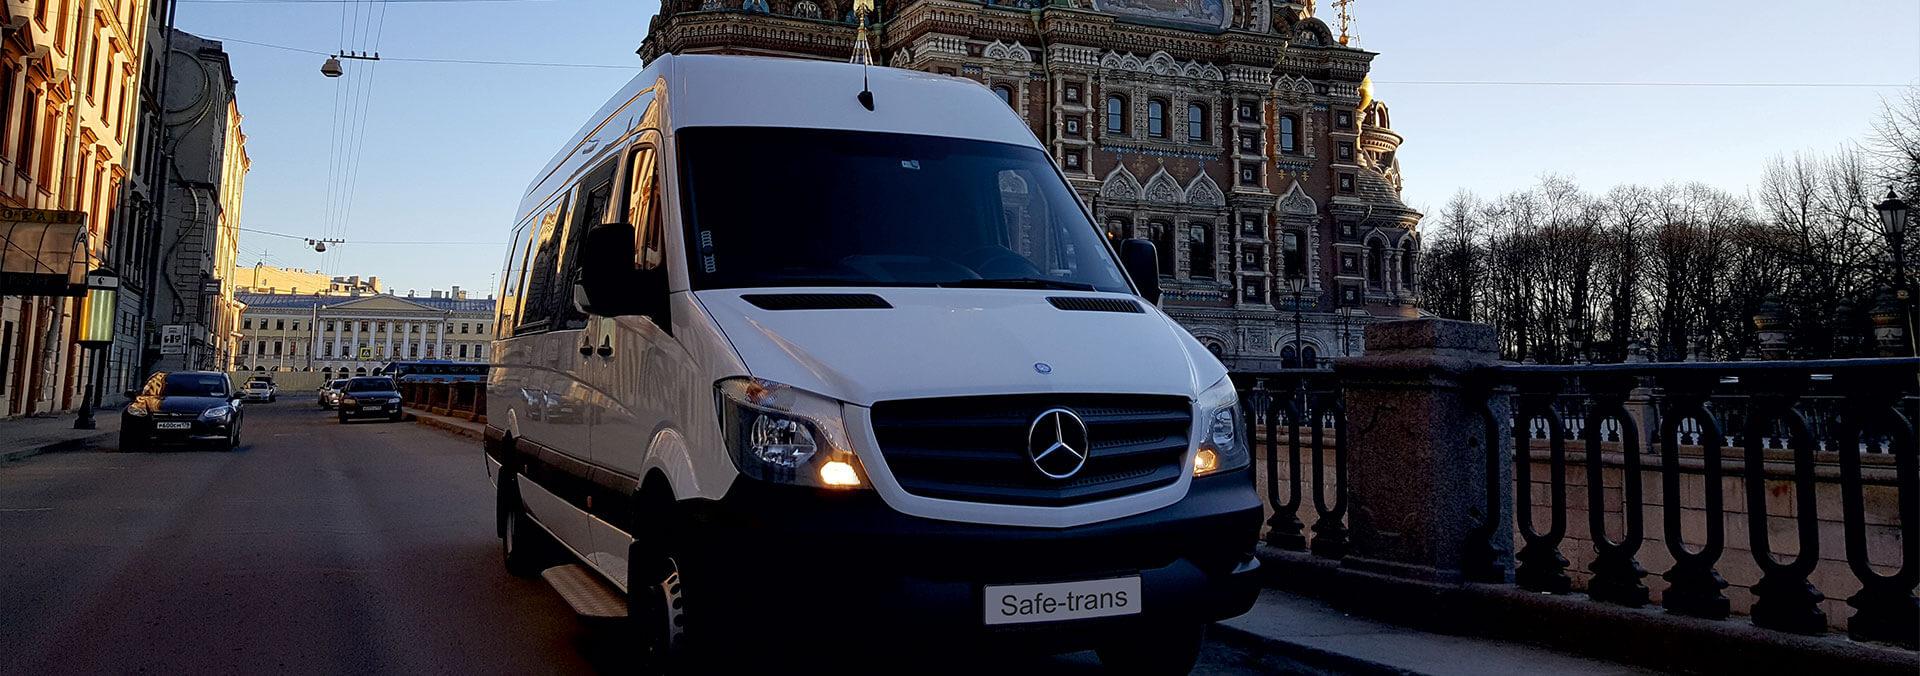 slide Аренда микроавтобусов в Питербурге